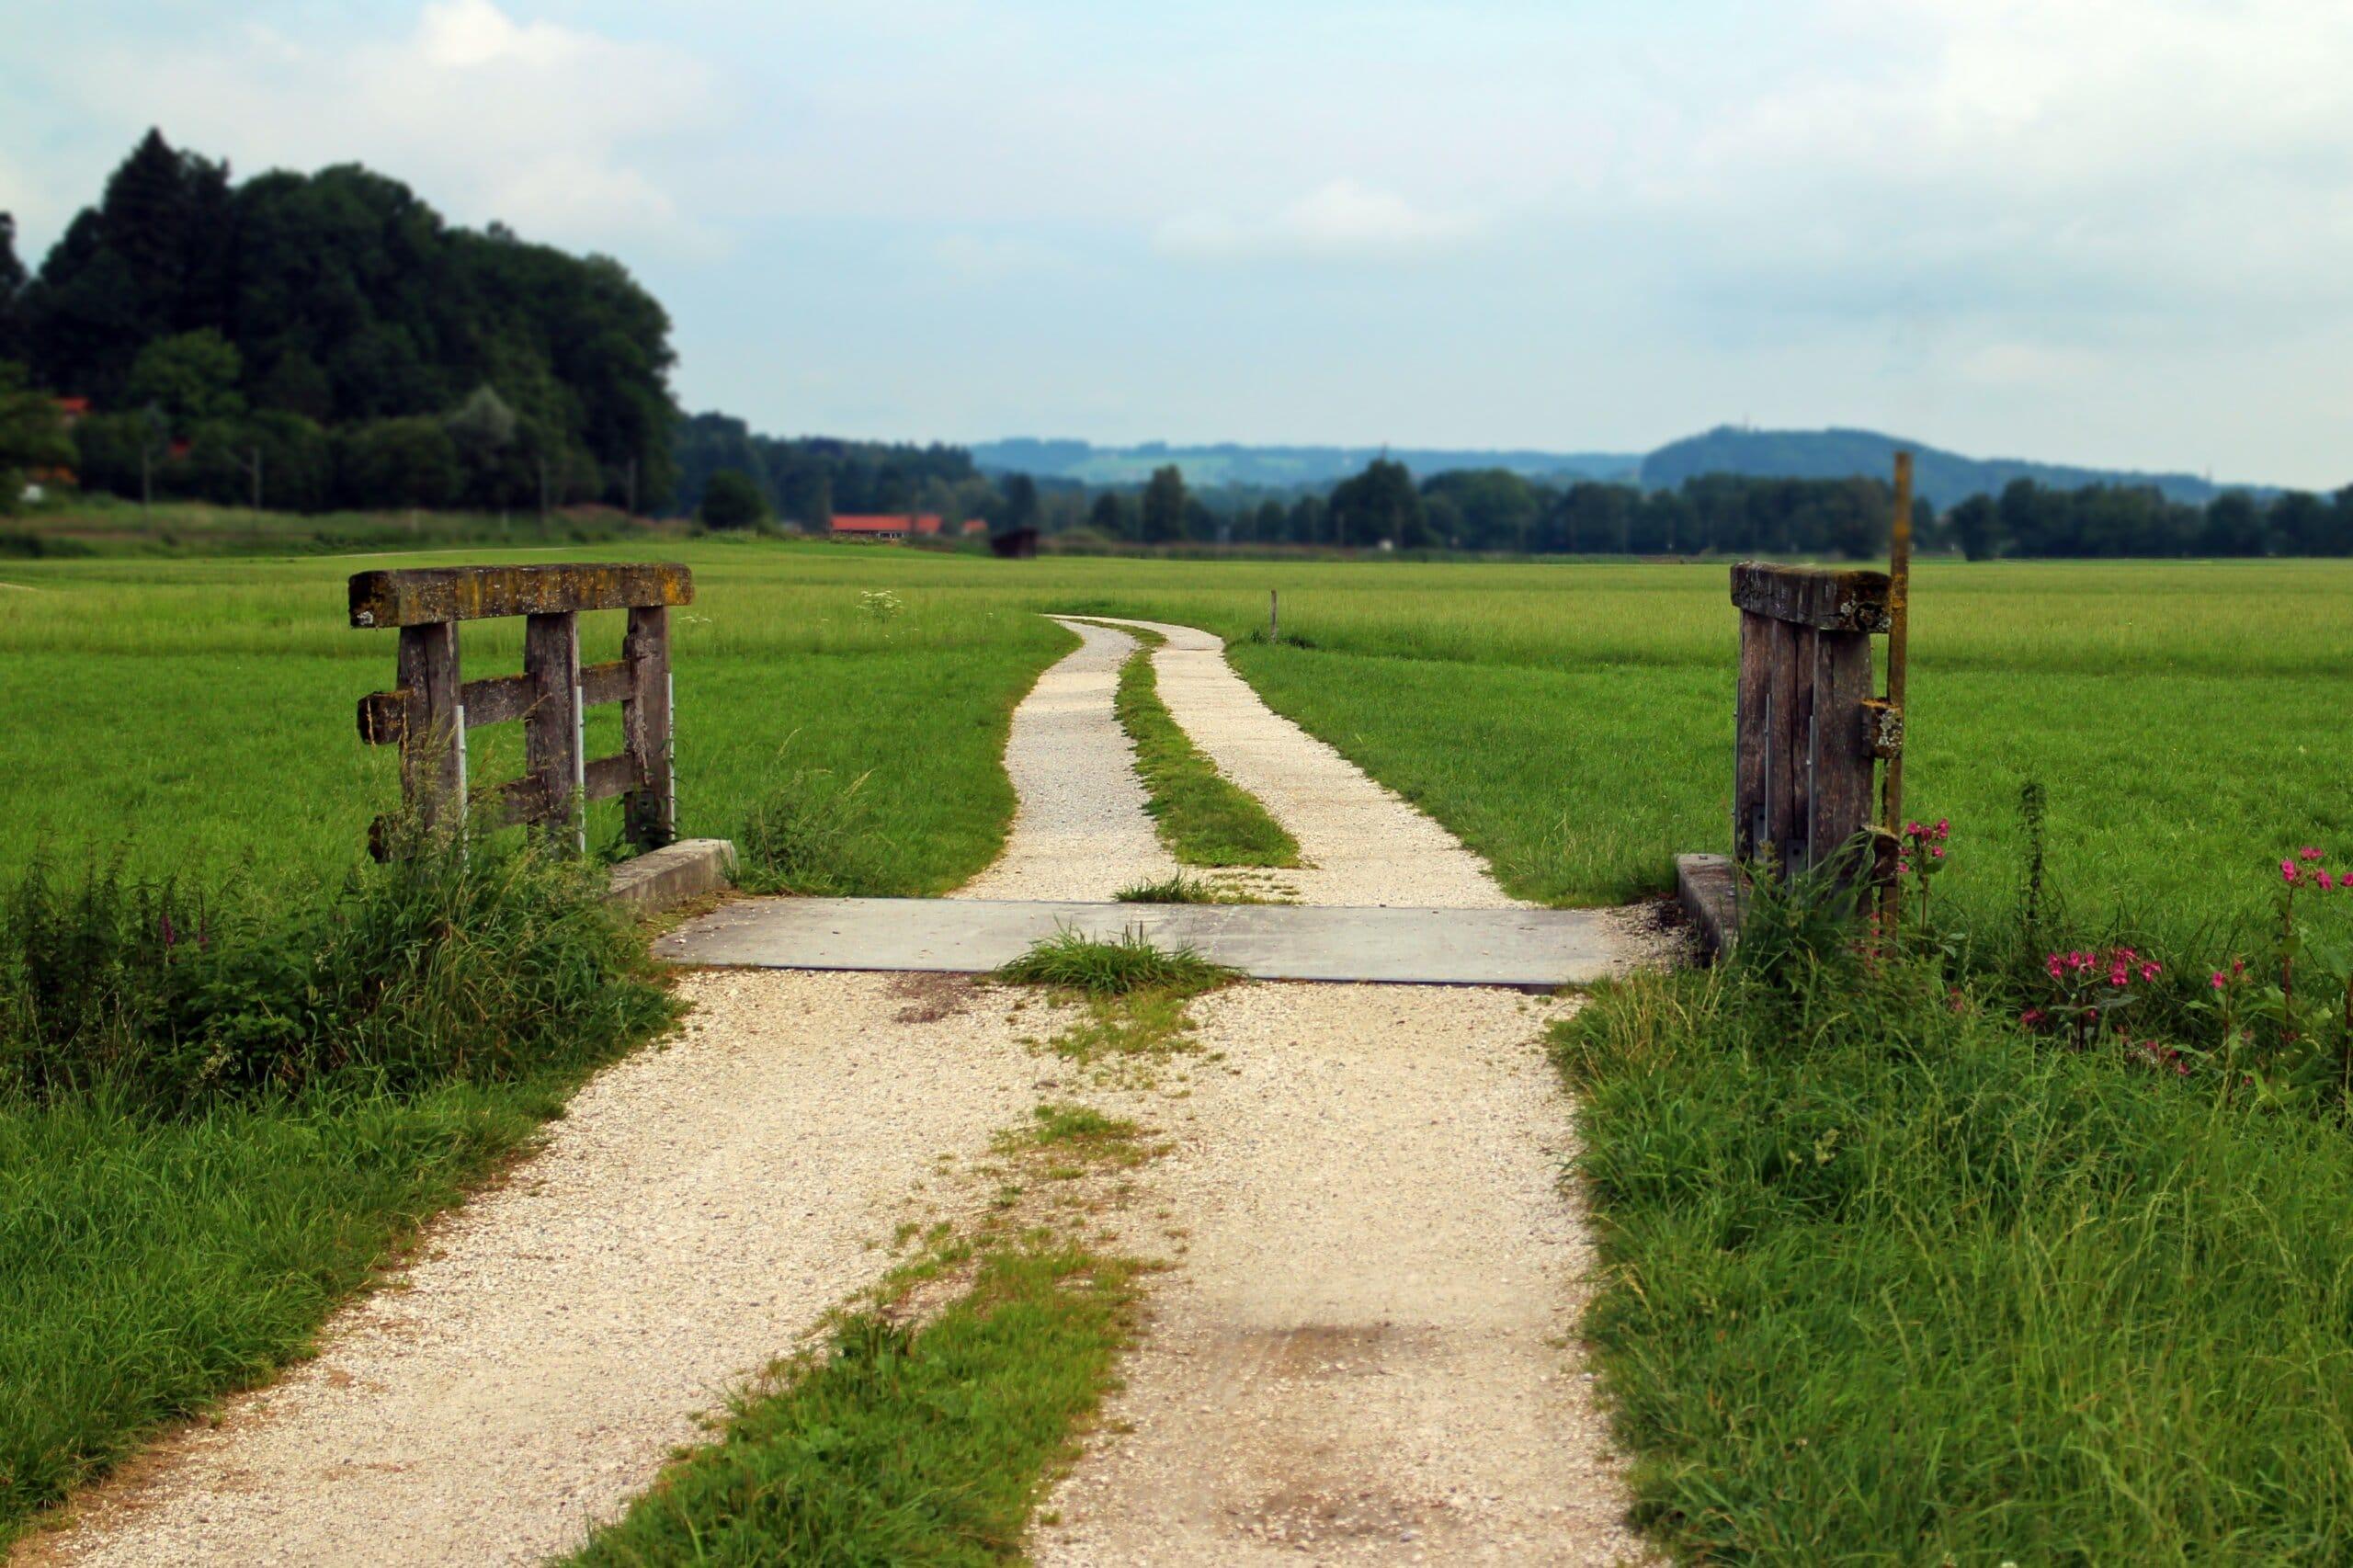 Feldweg grüner Wiese